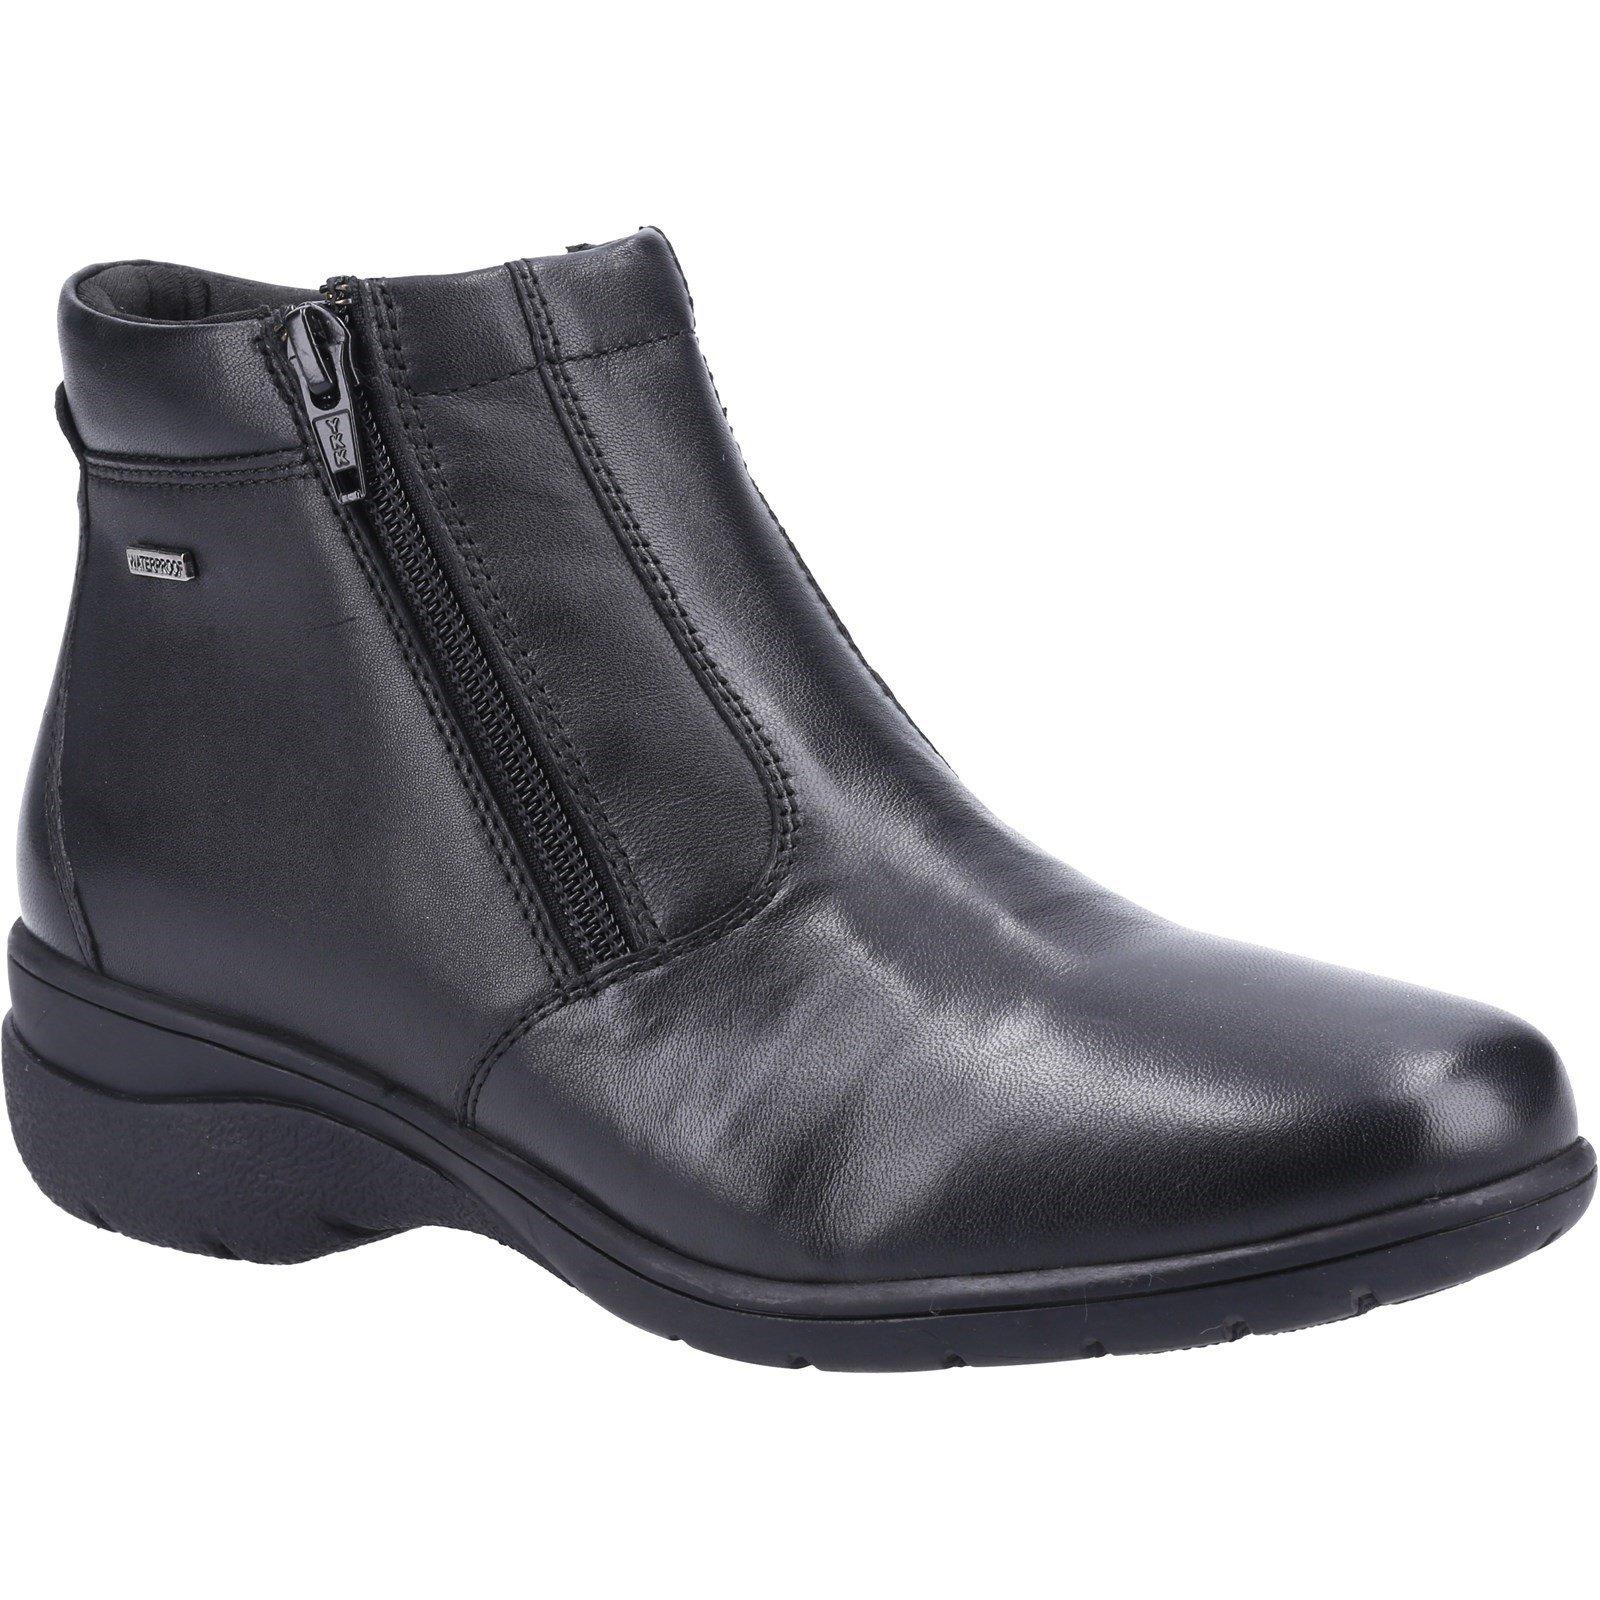 Cotswold Women's Deerhurst Waterproof Boot Black - Black 5